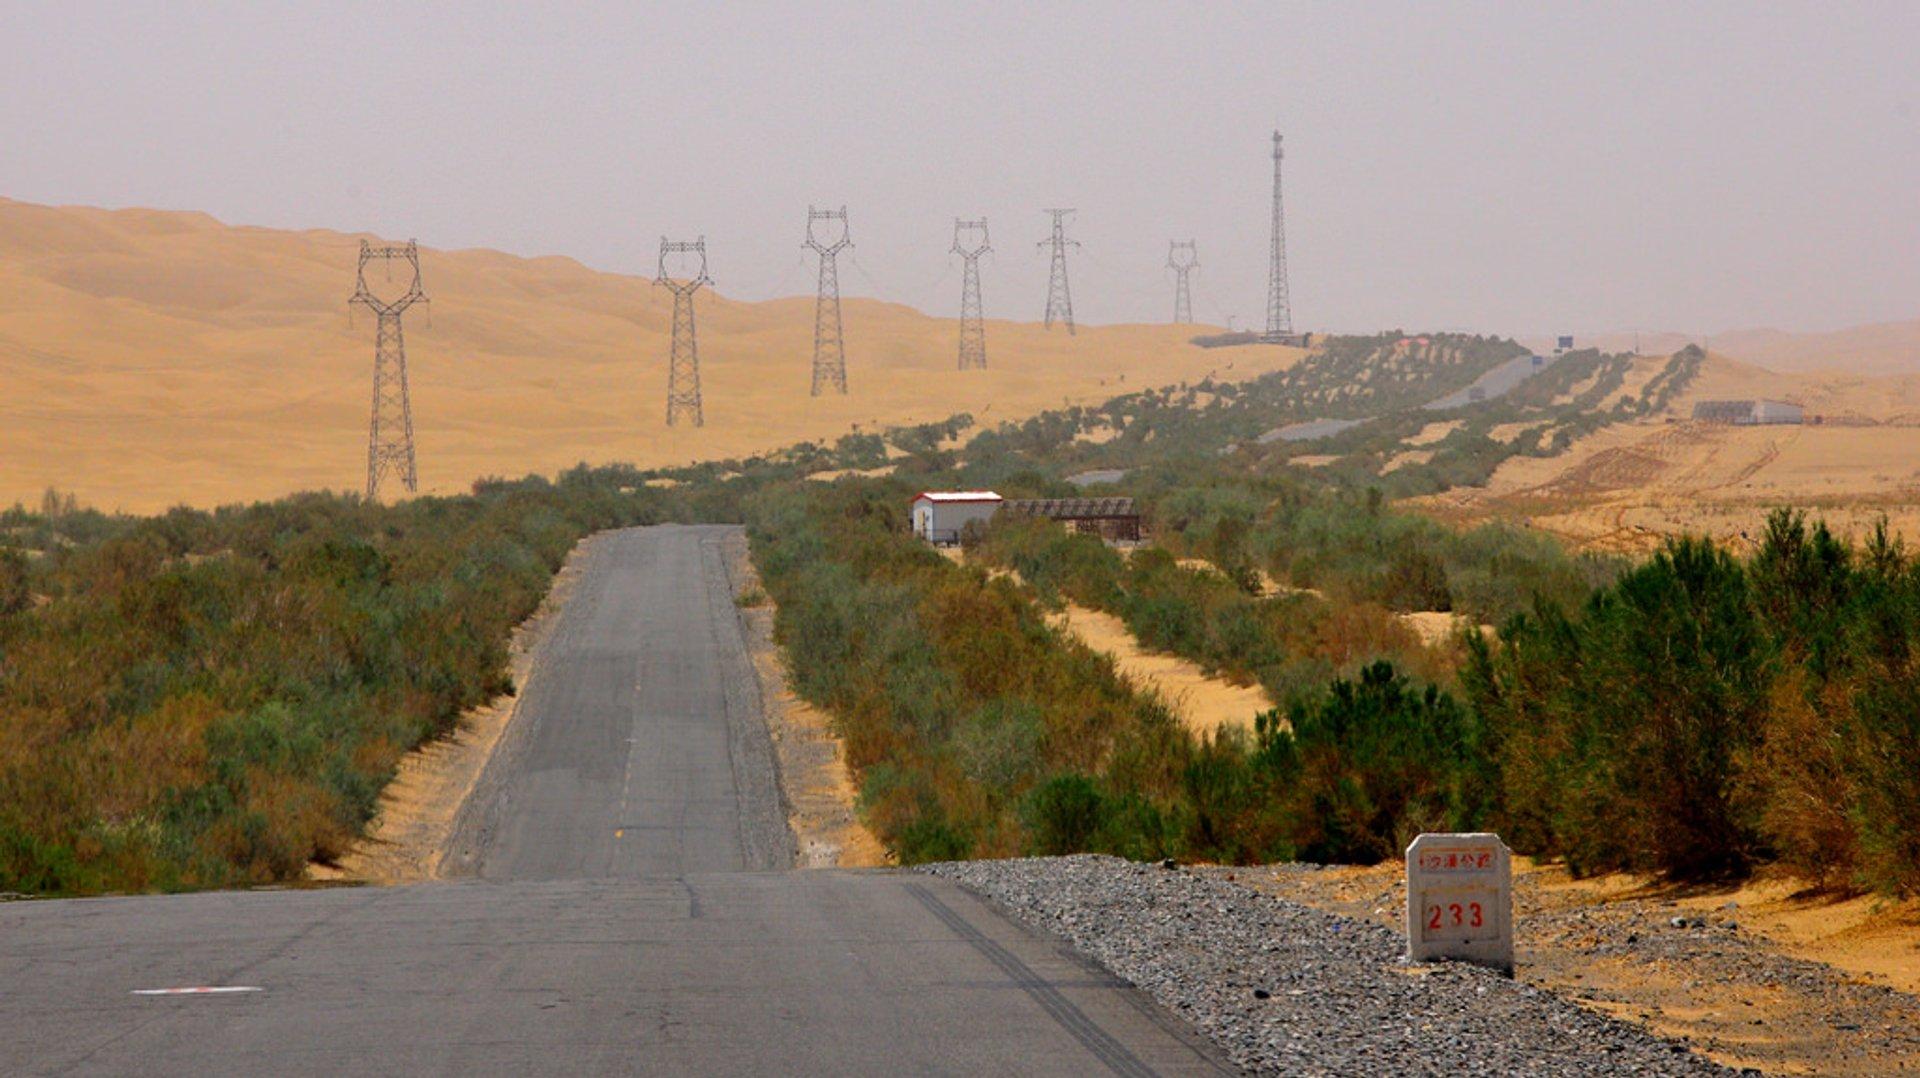 Tarim Desert Highway in China 2020 - Best Time